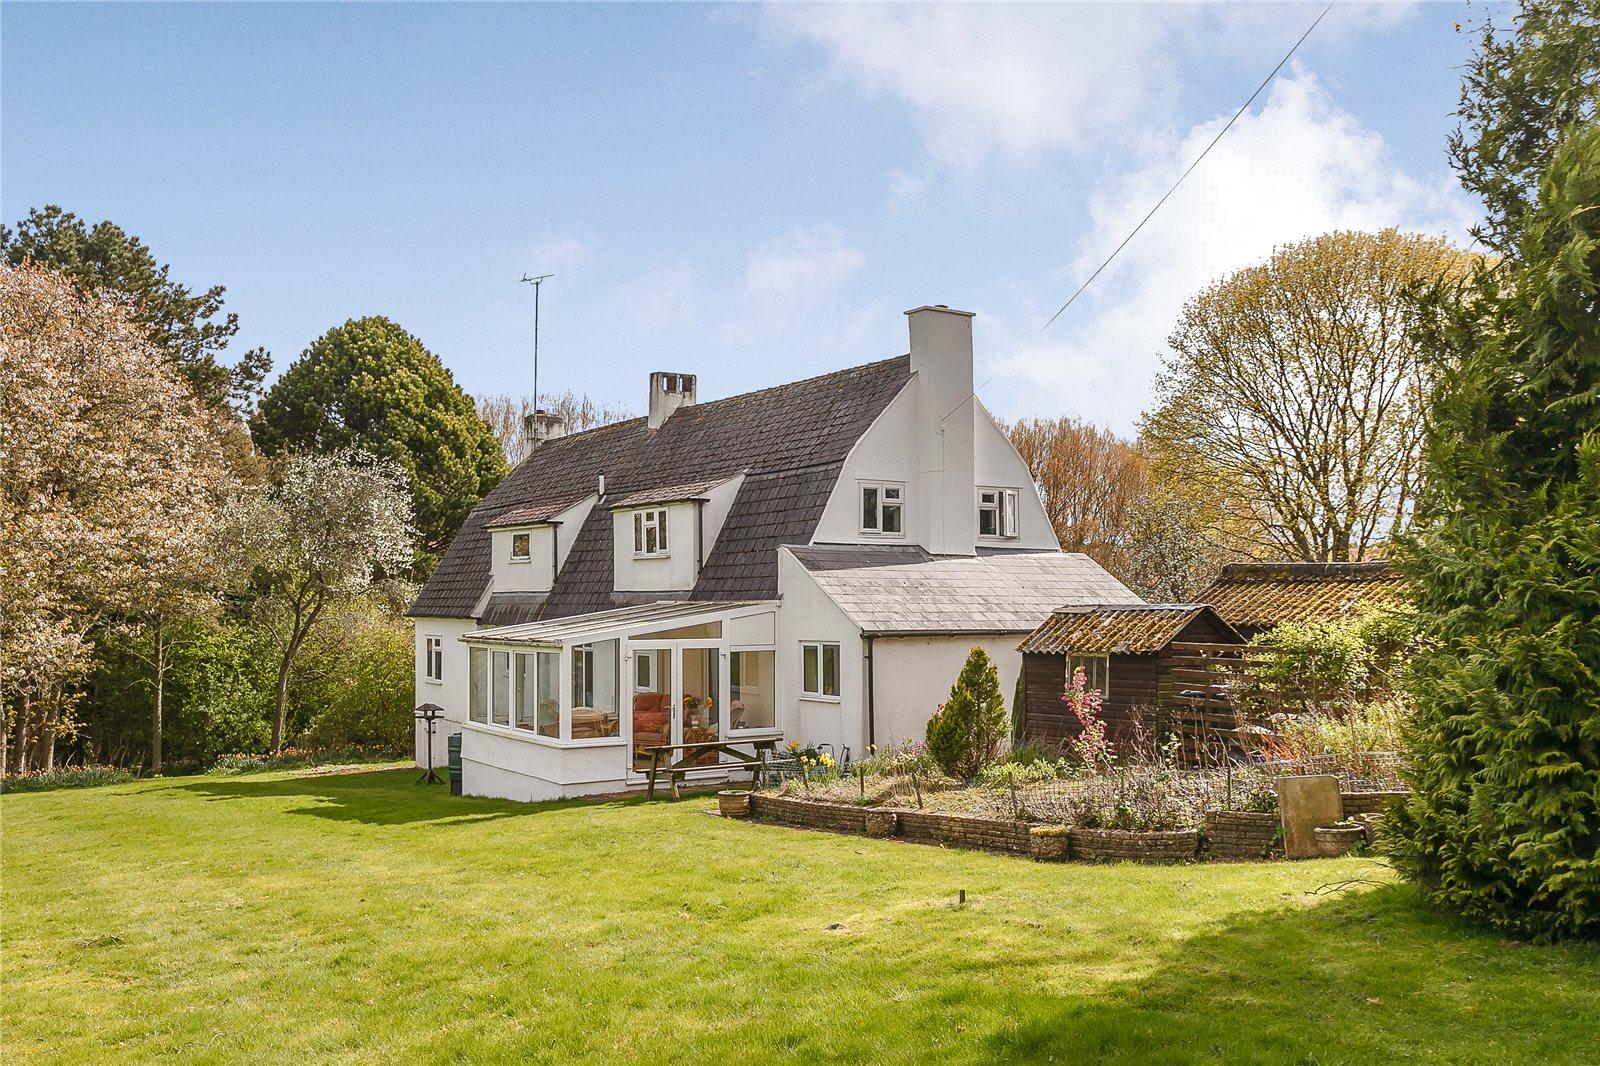 Villa per Vendita alle ore Perrotts Brook, Cirencester, Gloucestershire, GL7 Cirencester, Inghilterra